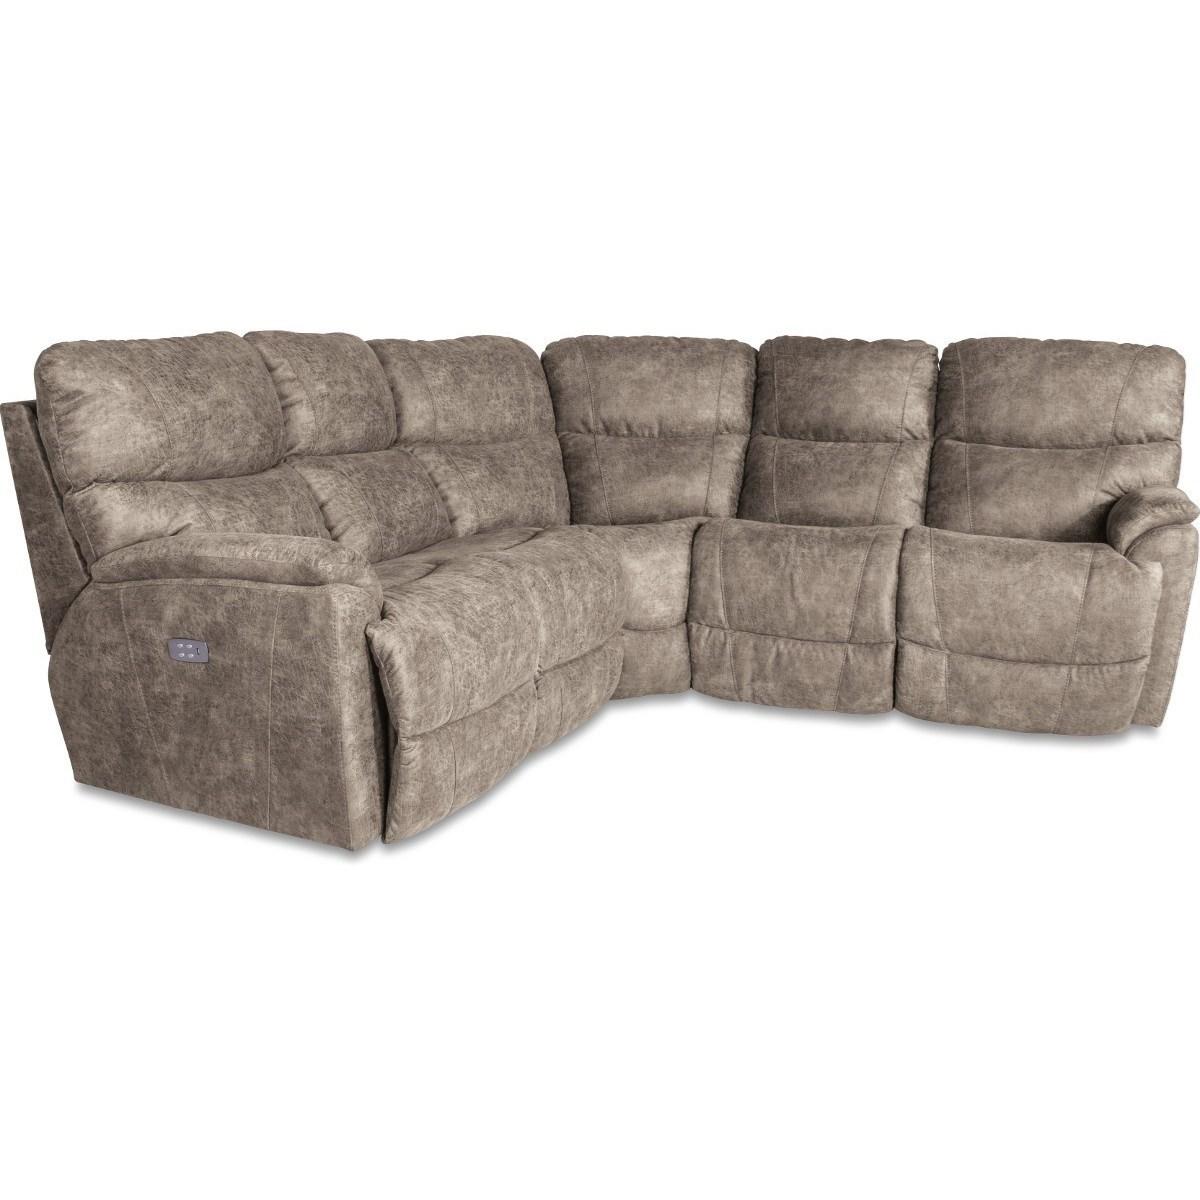 Three Piece Power Reclining Corner Sectional Sofa with USB Ports